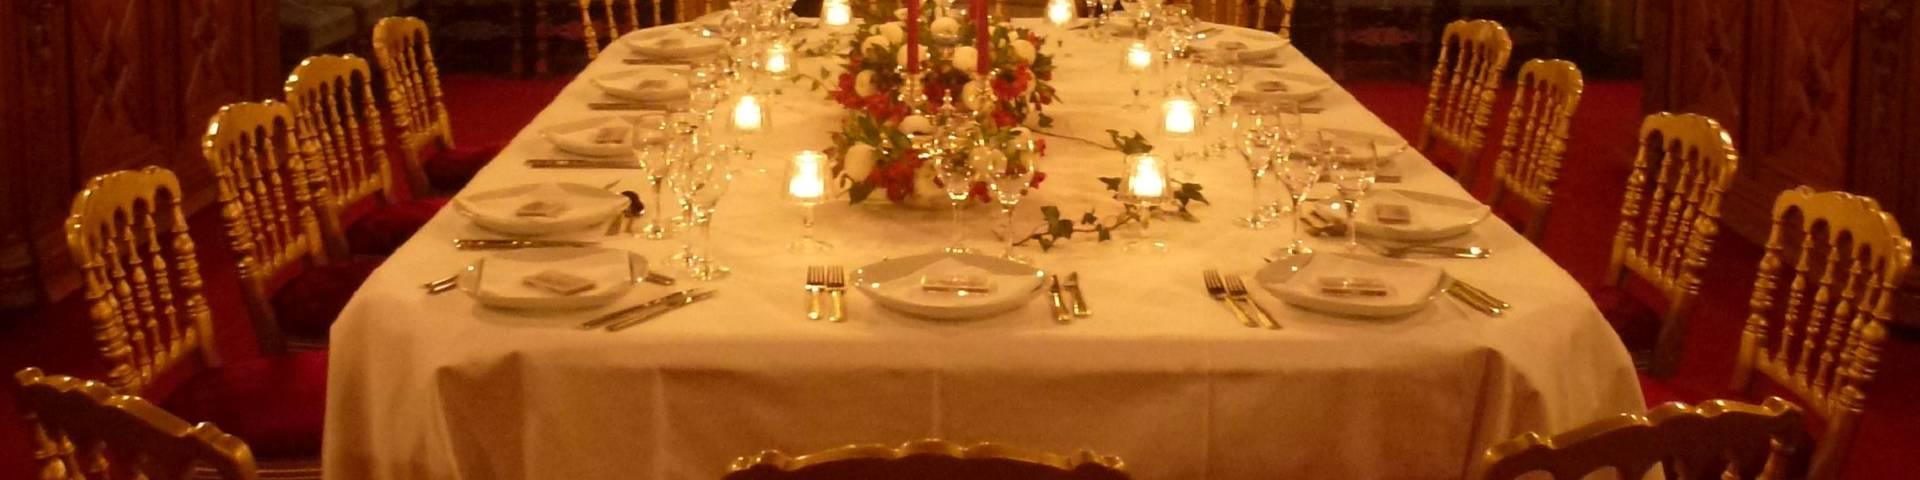 Prestigious dinner at the Château de Cheverny. © OTBC